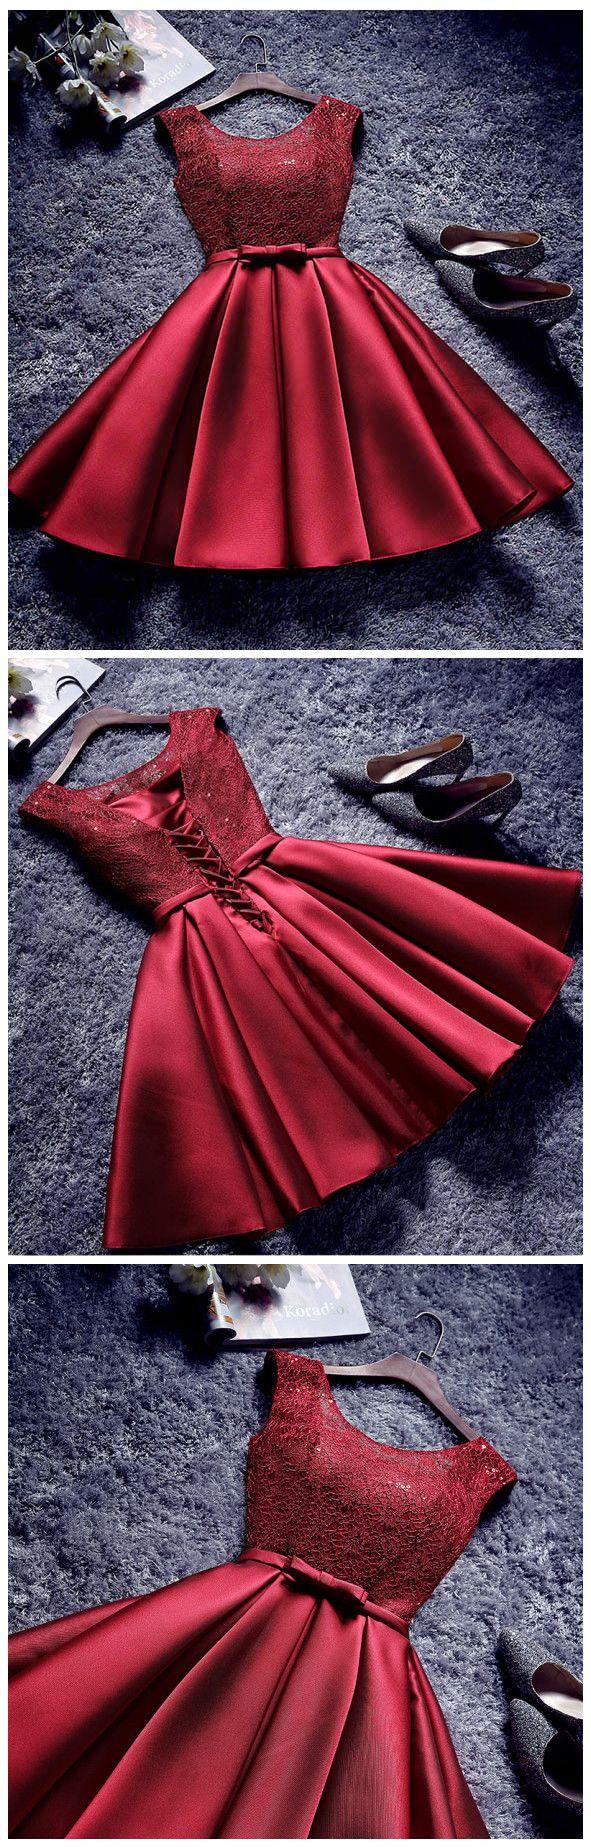 Pin by madhurima dasi on fashion pinterest dresses prom dresses